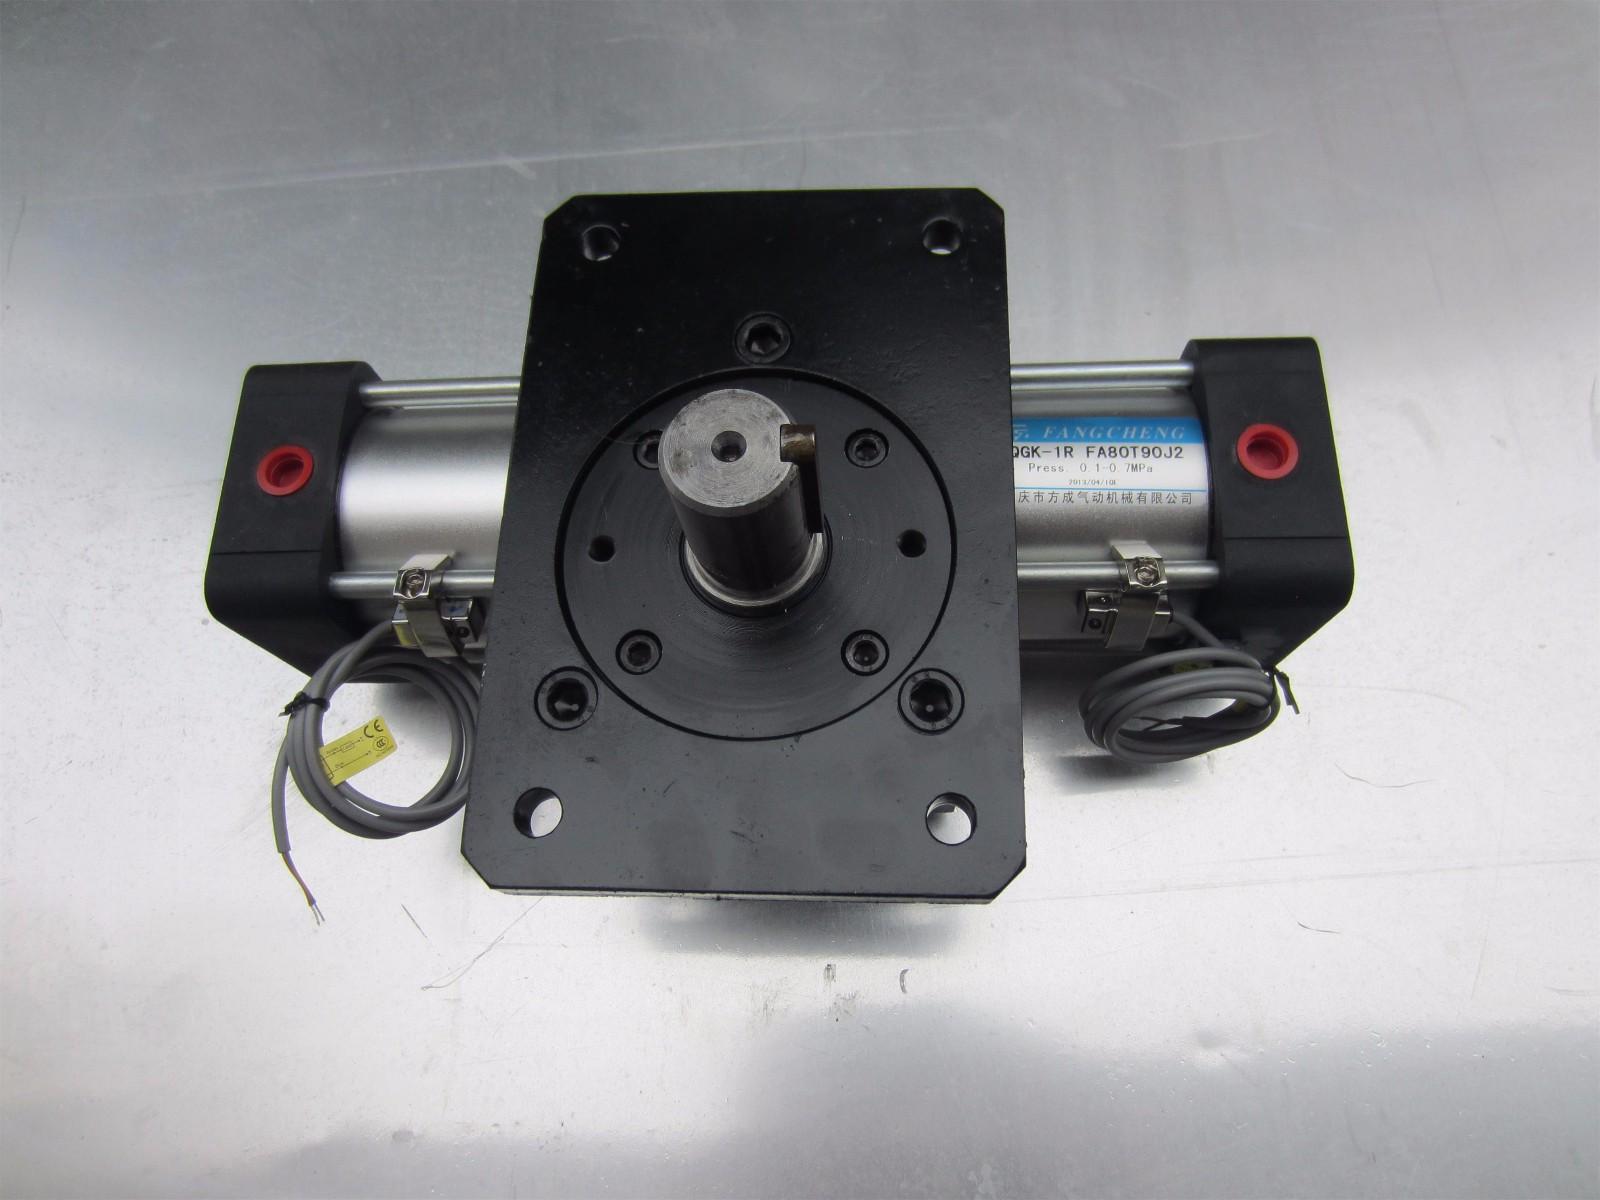 QGK-1R FA80T90J2.jpg